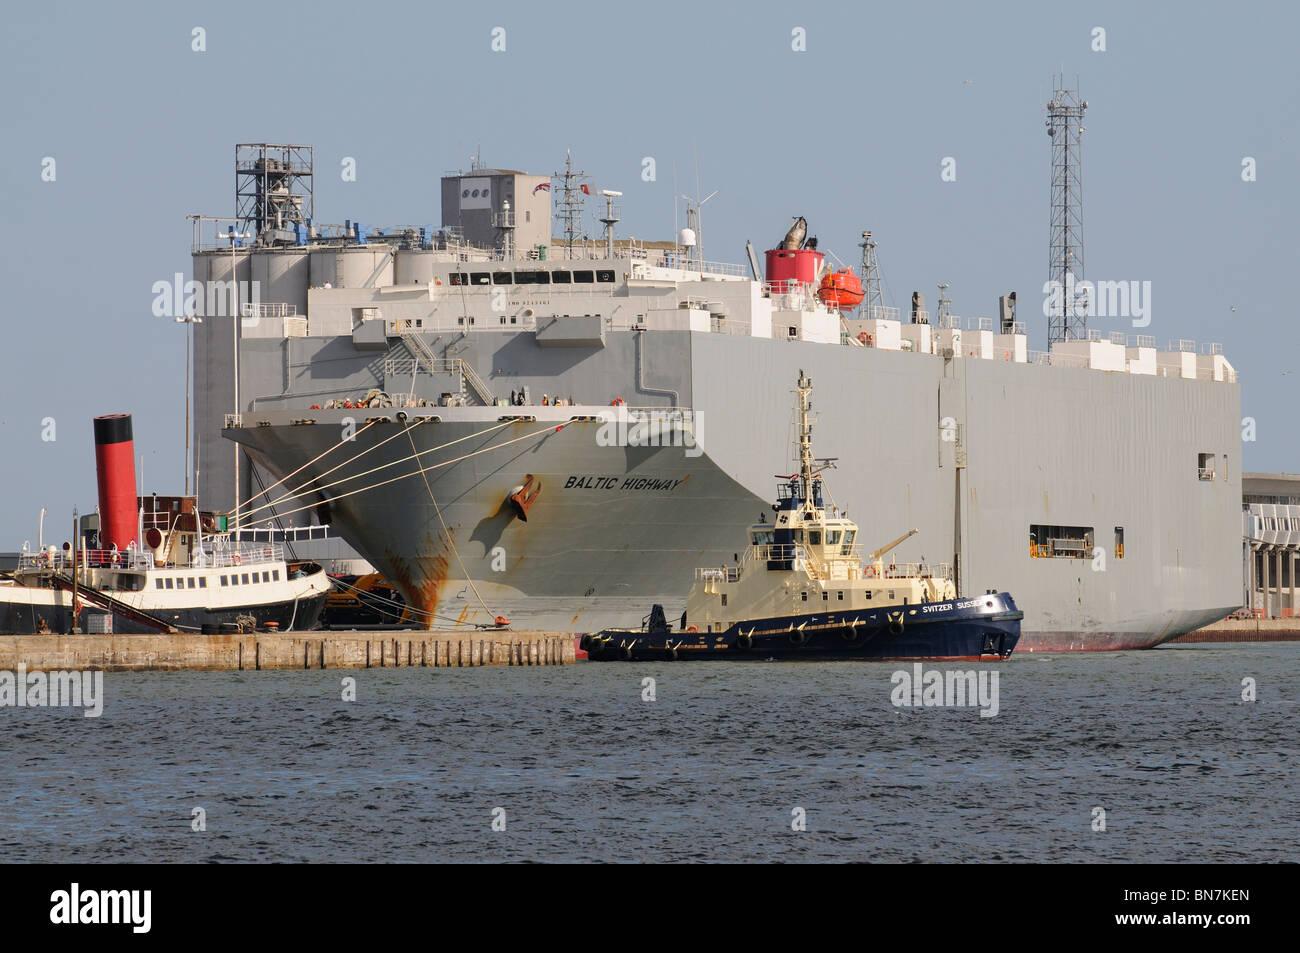 Port of Southampton the Svitzer Sussex tug and Baltic Highway moored alongside. England UK - Stock Image